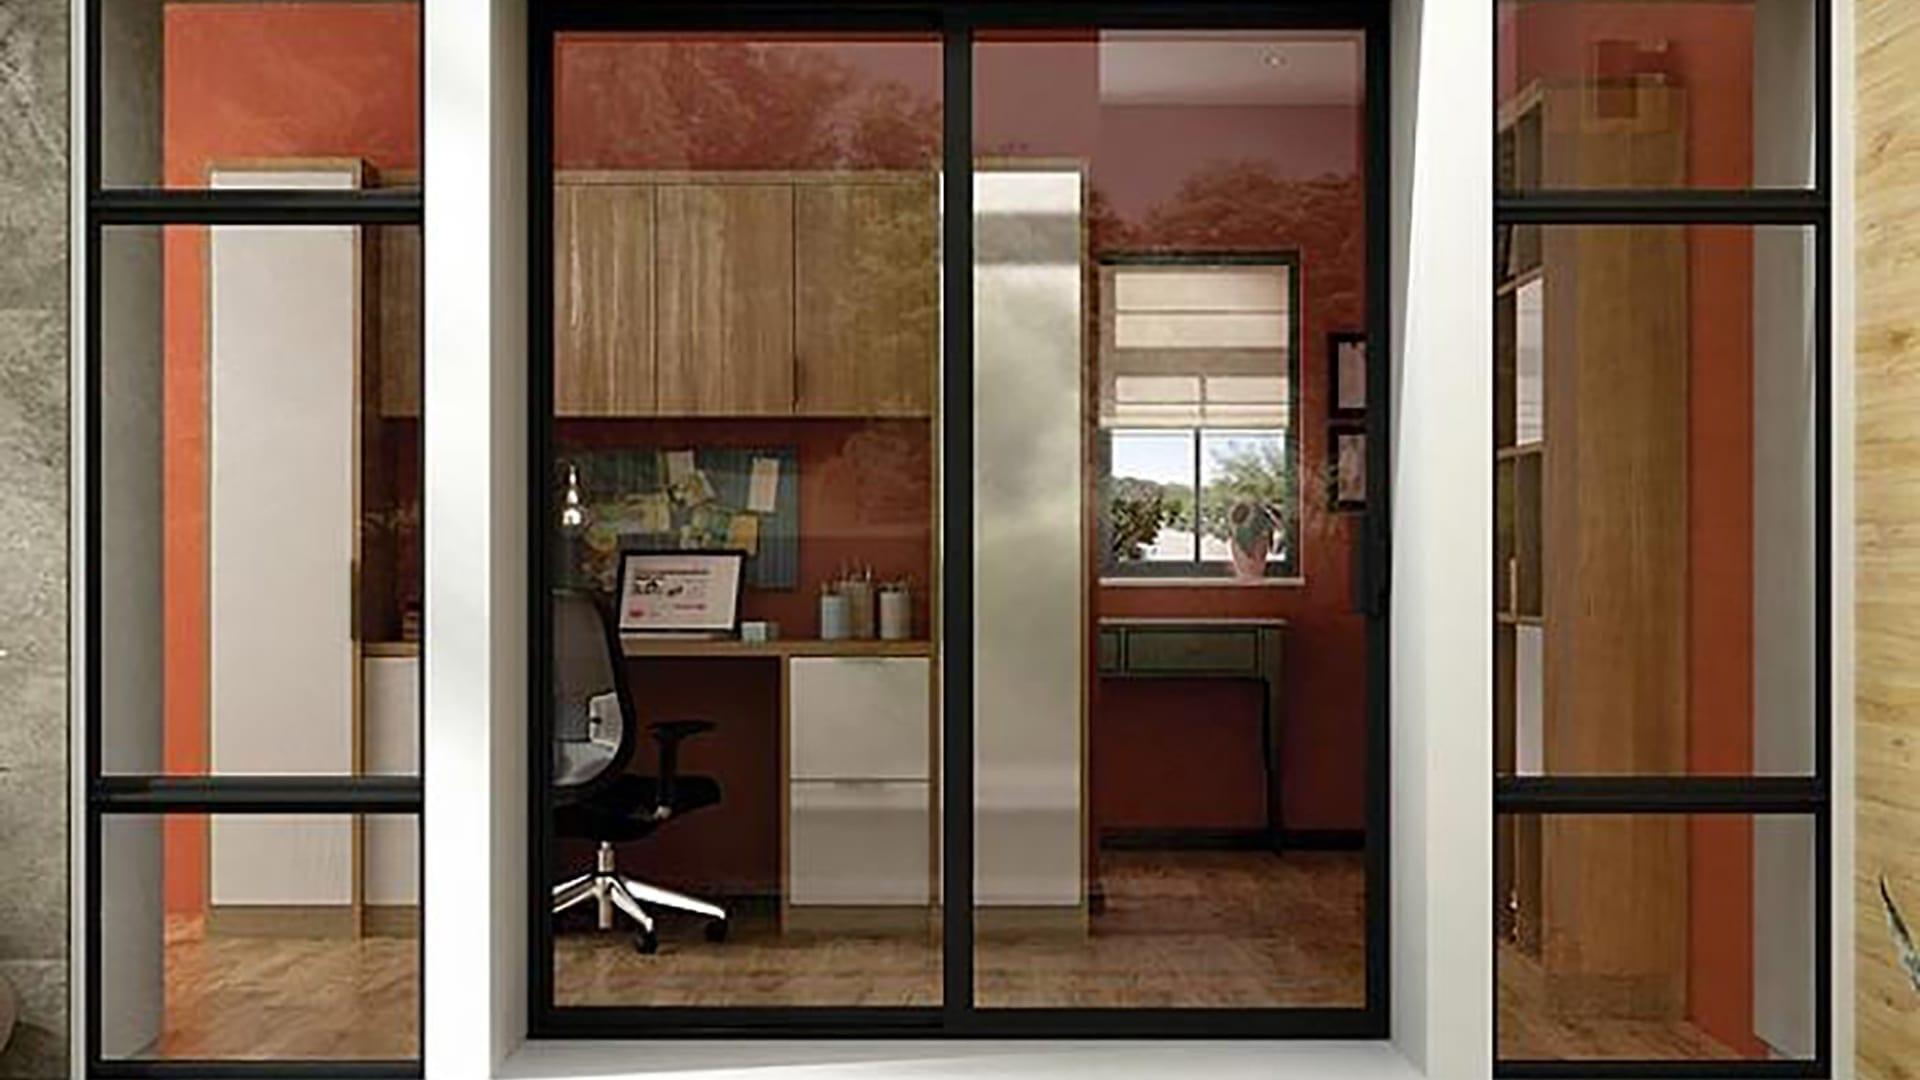 Milgard photogrids 2col sgd aluminum - Sliding Patio Doors